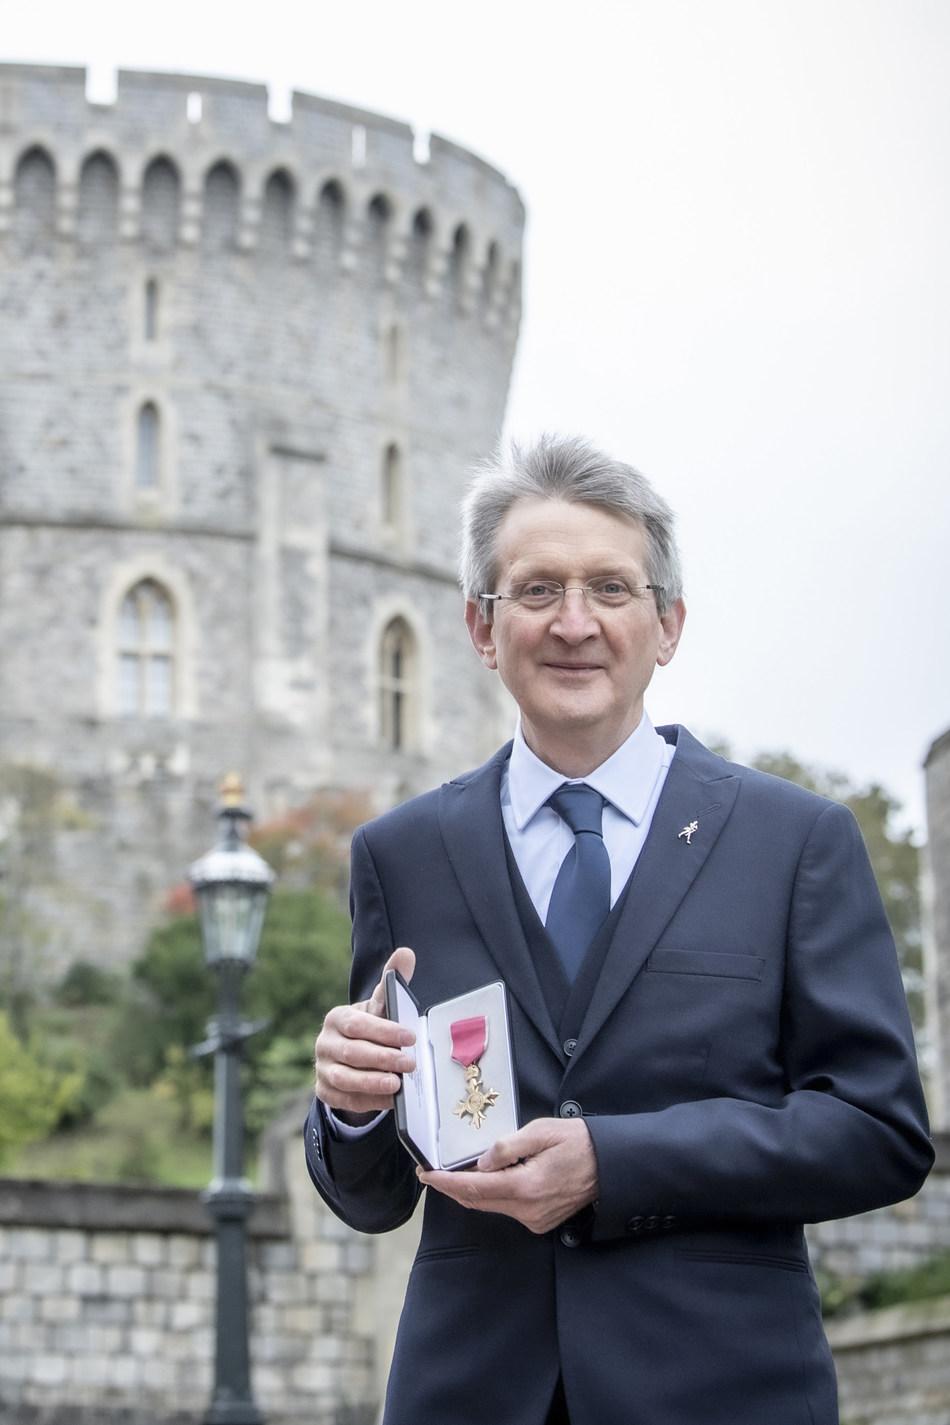 Dr. Jim Beveridge with his OBE award outside Windsor Castle.